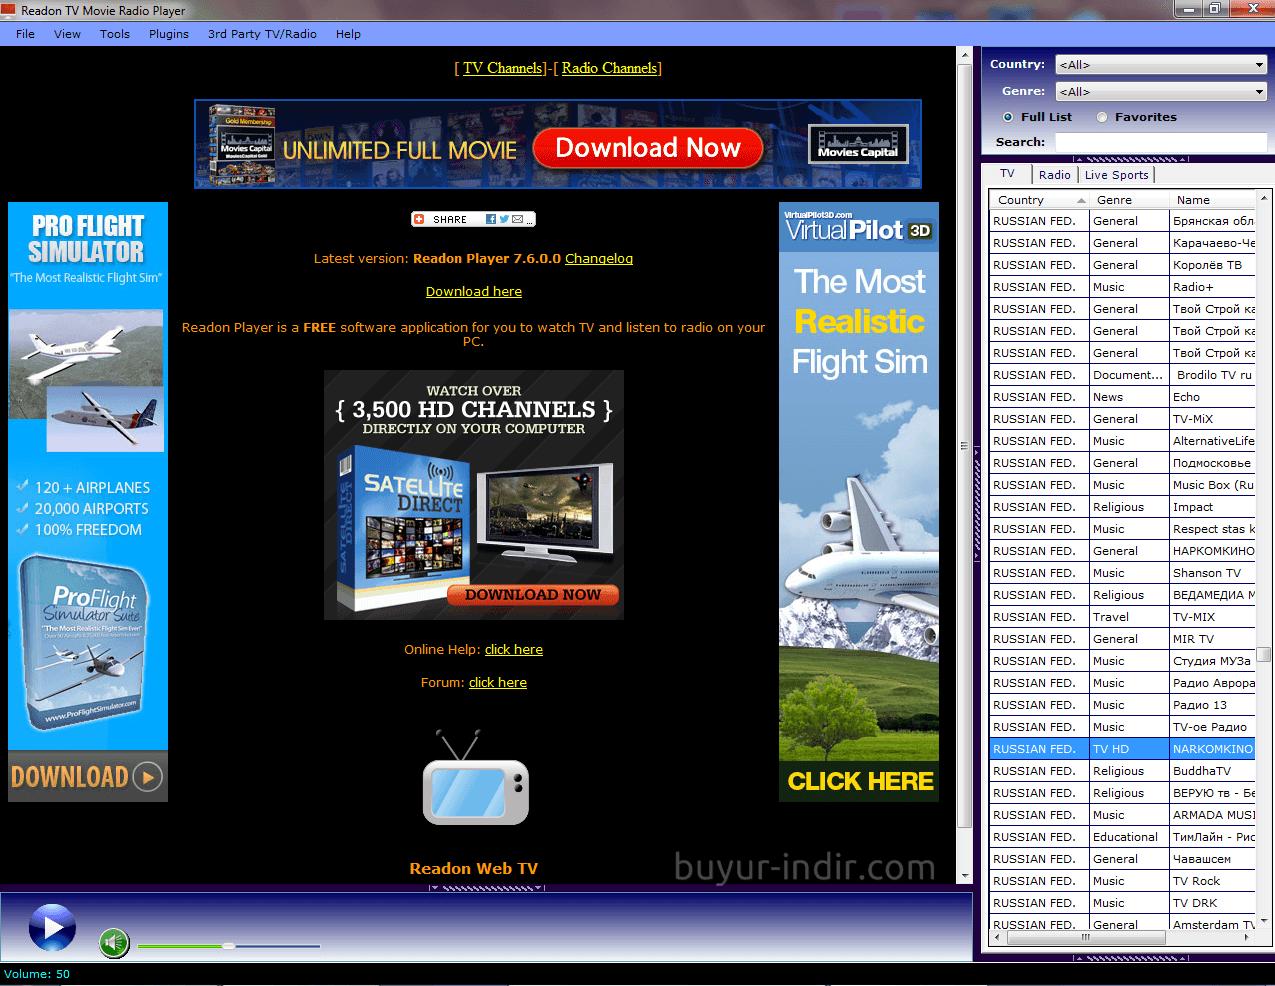 Adobe Photoshop Cs6 Cracked Installer Serial Number Mac Lockcola